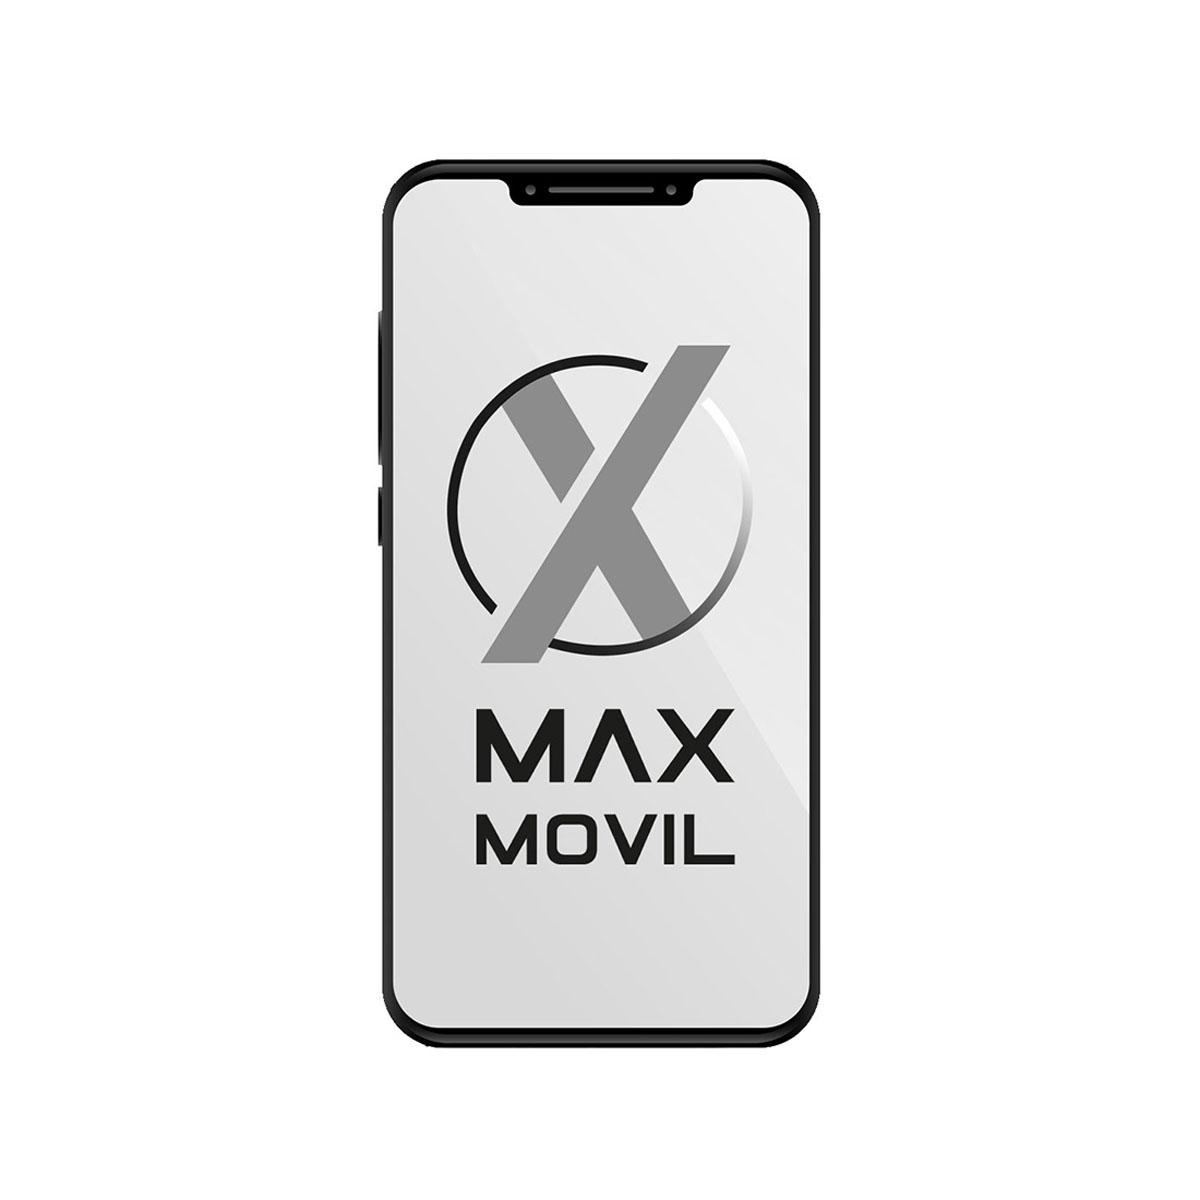 Funda Smart Cover para iPad mini 4 Blanca MKLW2ZM/A